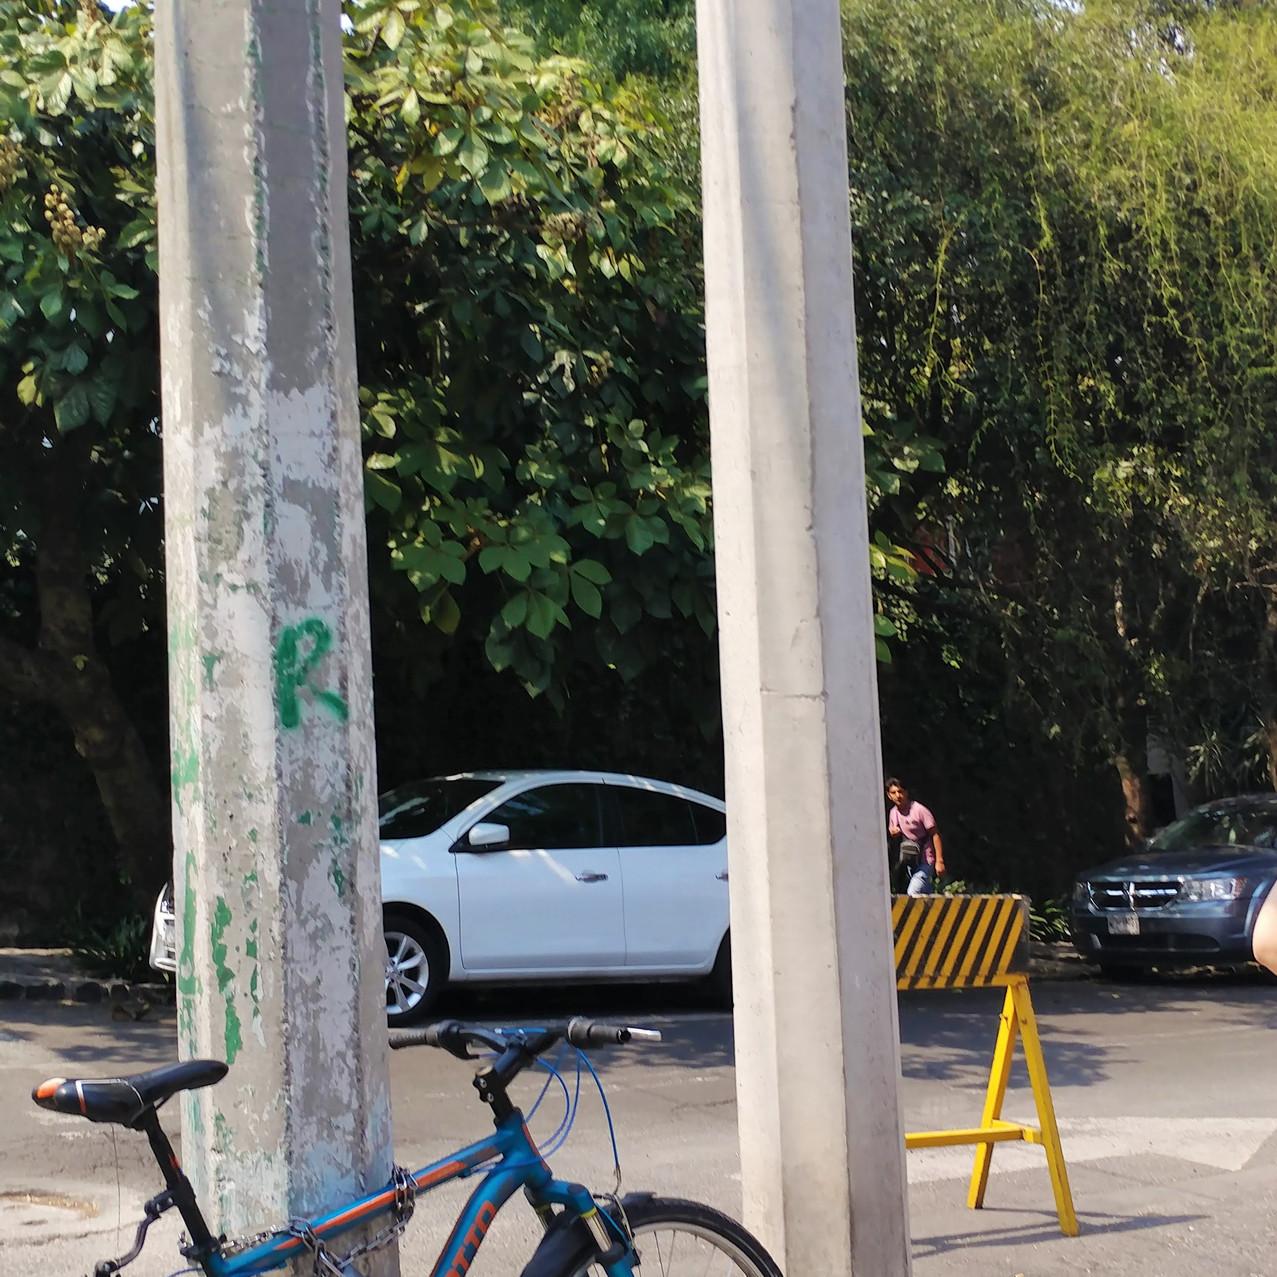 A bike parked by a street pole